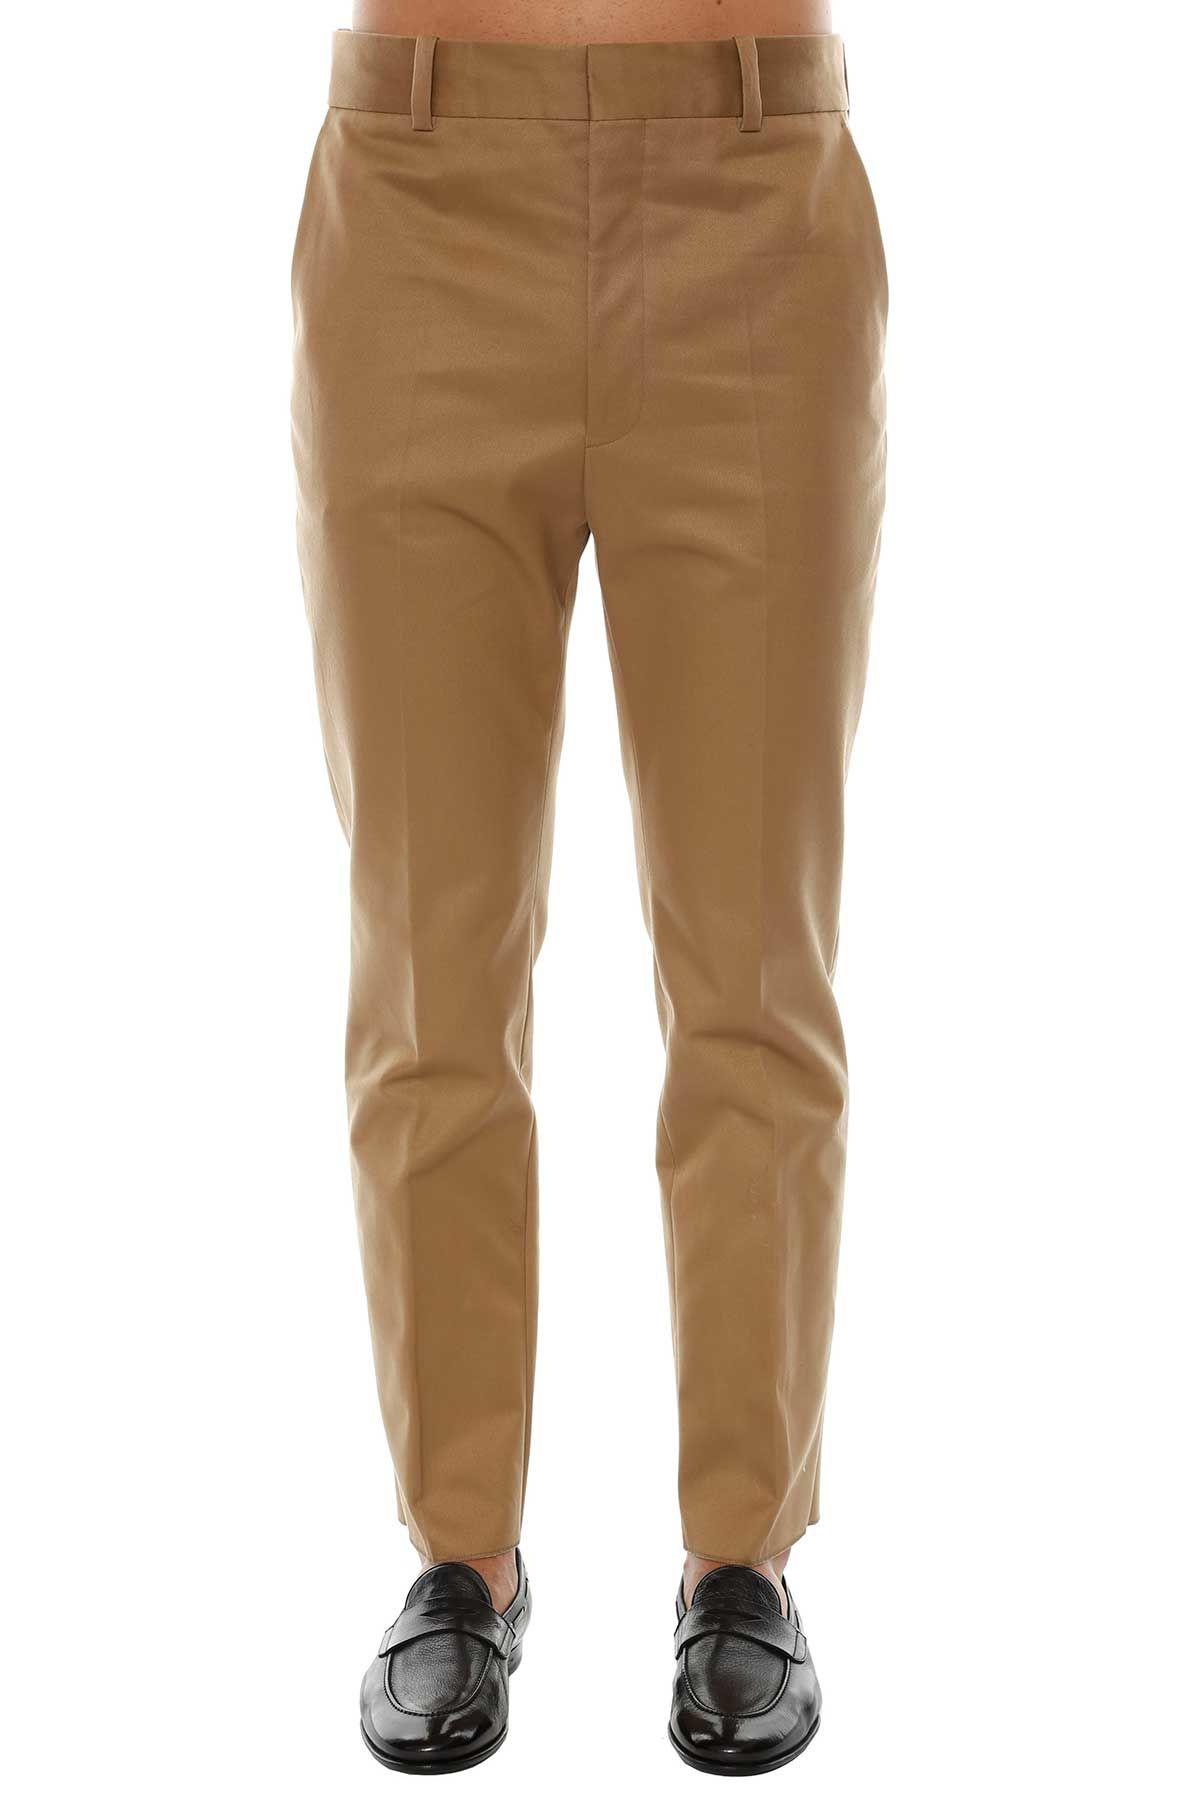 Balenciaga Cropped Trousers